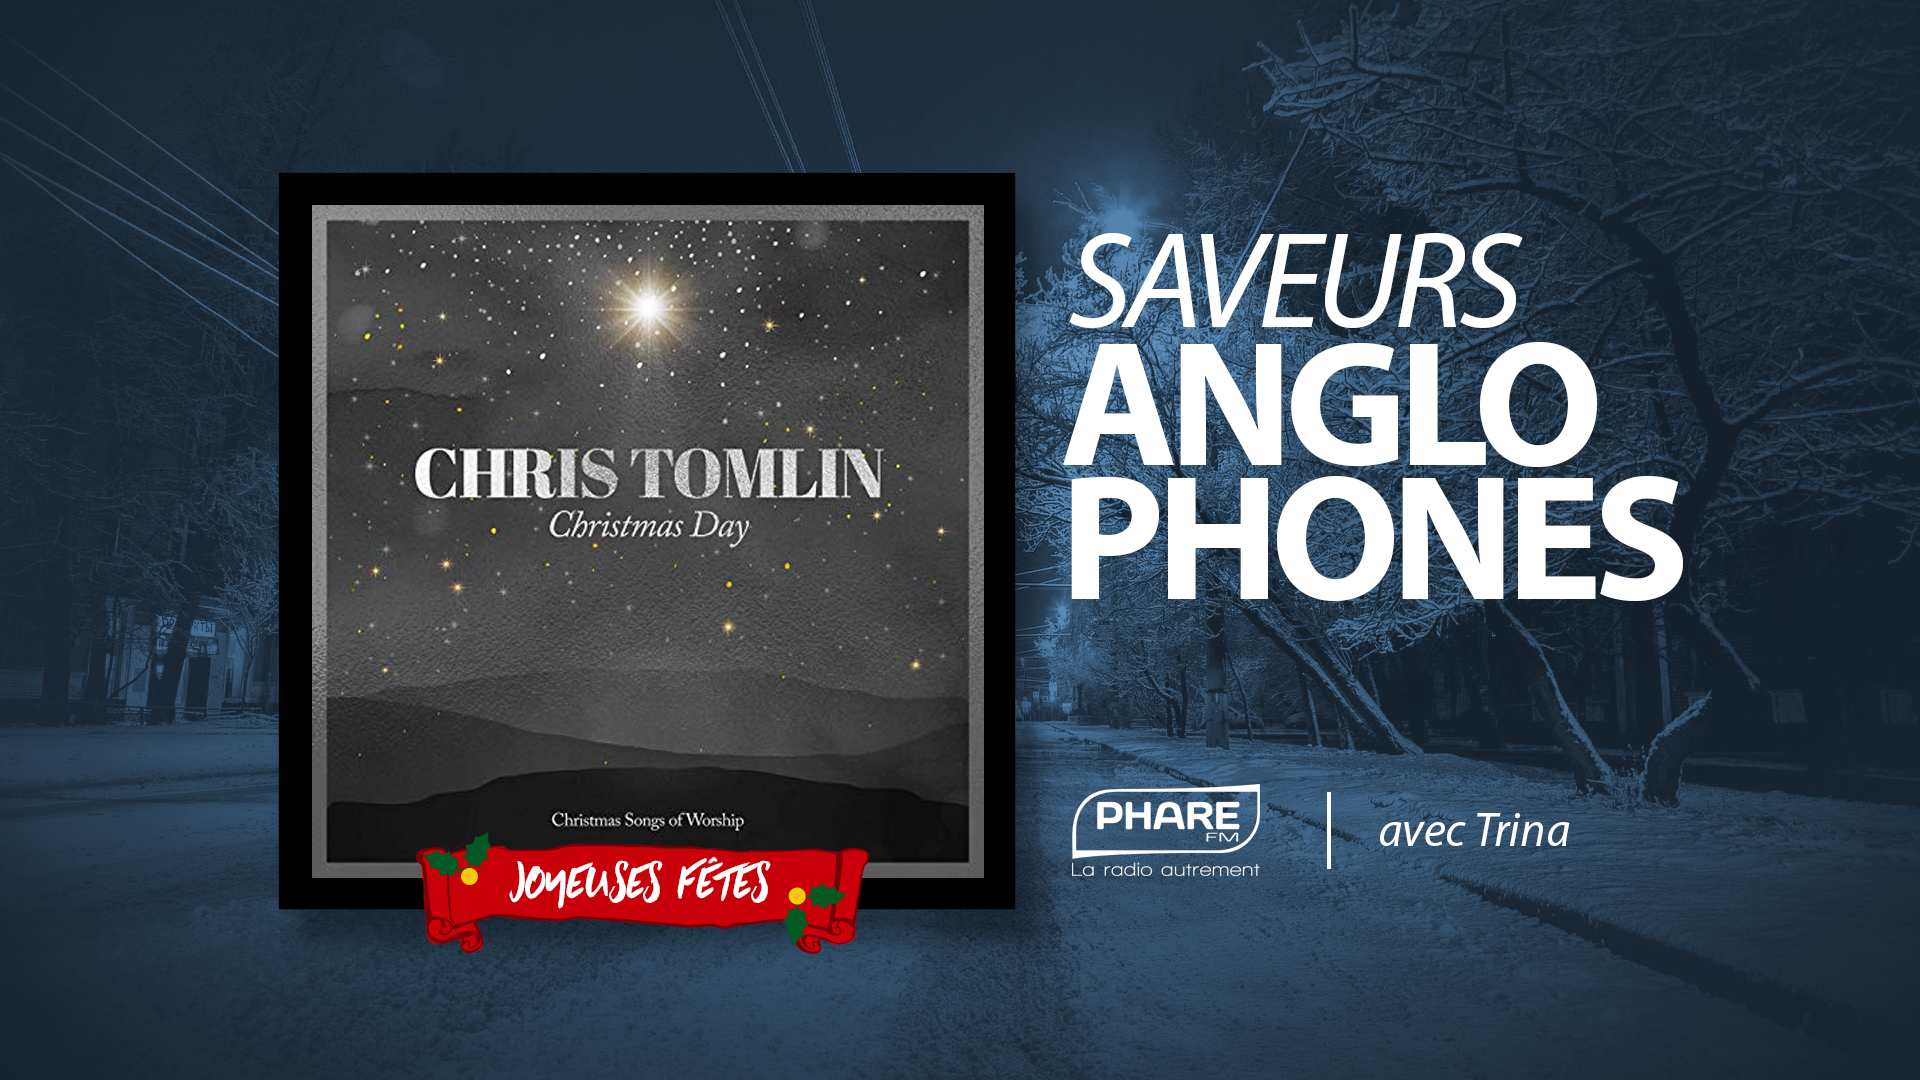 Saveurs Anglophones 129 - NOËL Chris Tomlin - Christmas Day